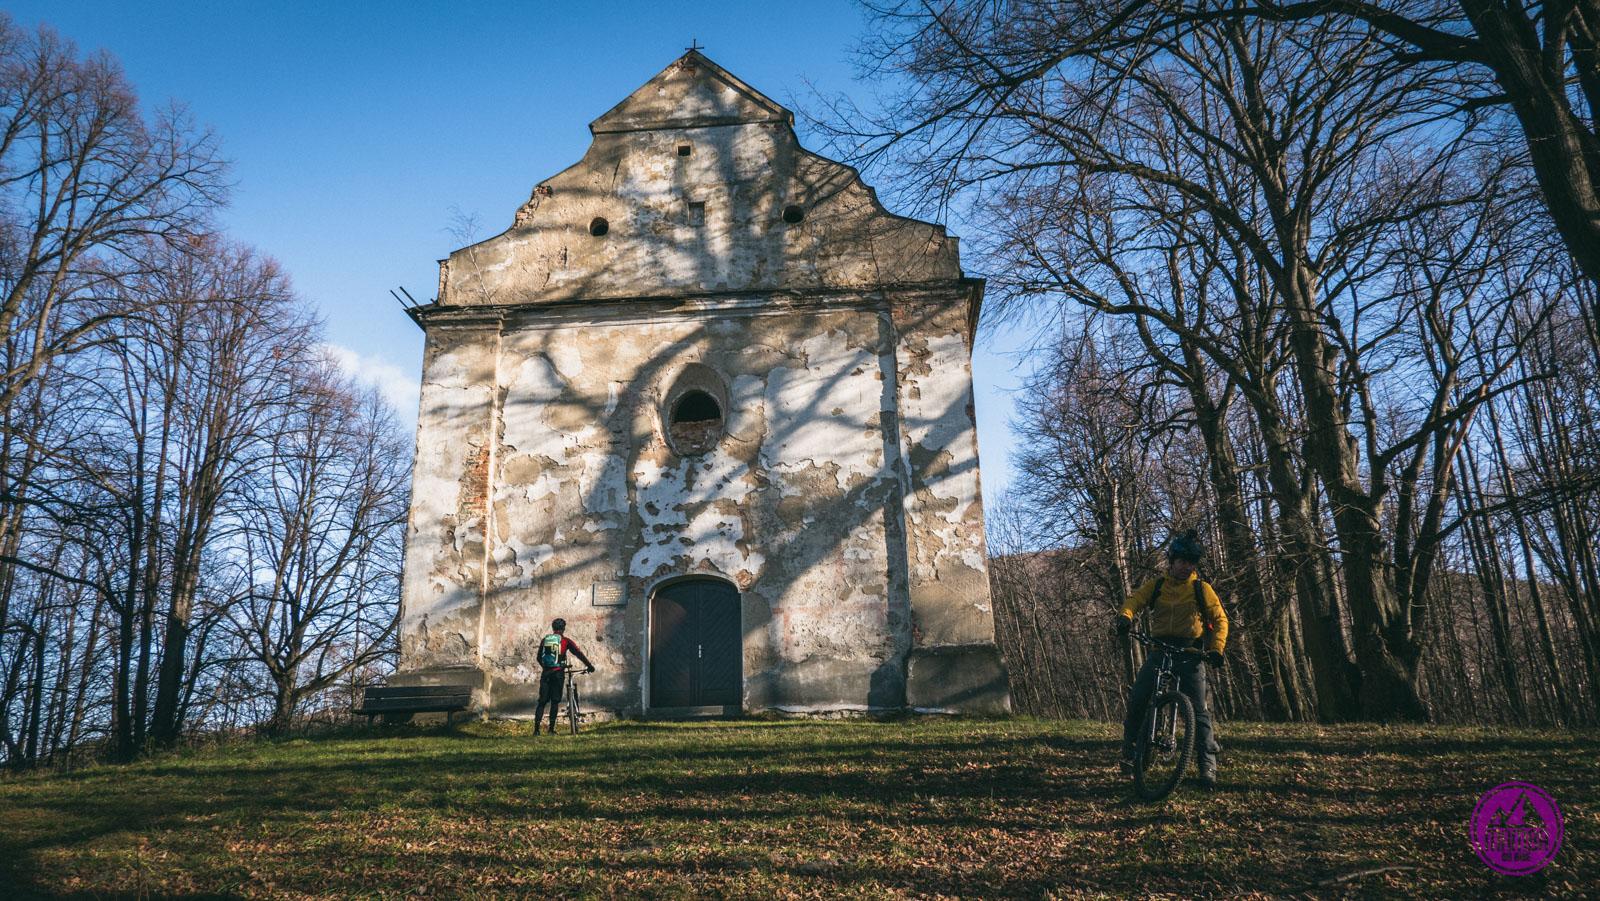 Zjazd rowerem z Biskupiej Kopy